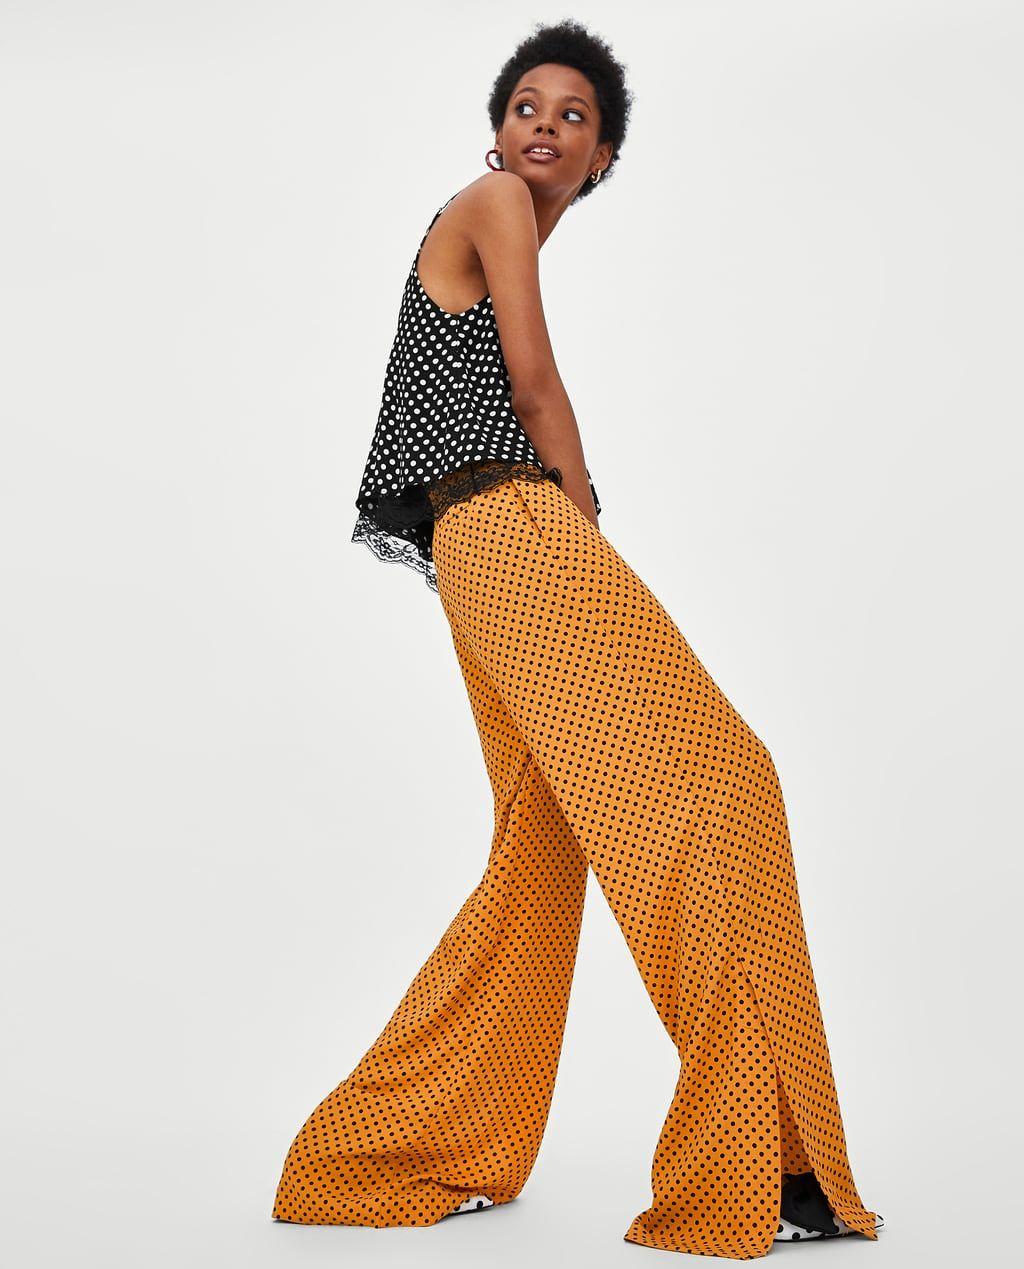 57c0500149 Image 1 of LONG FLOWING POLKA DOT PANTS from Zara | Style | Polka ...